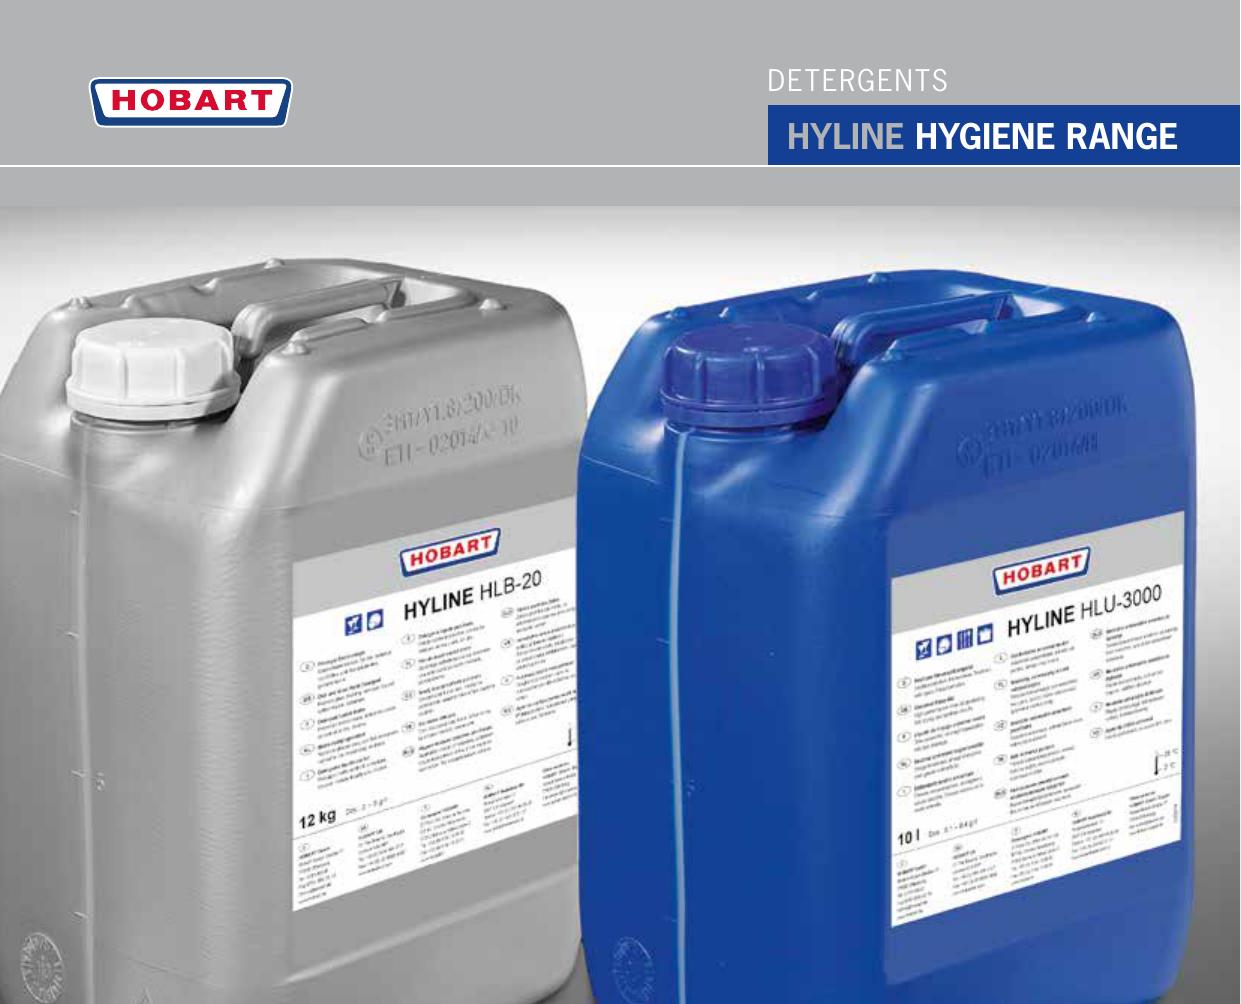 hyline hygiene range - hobart | manualzz com